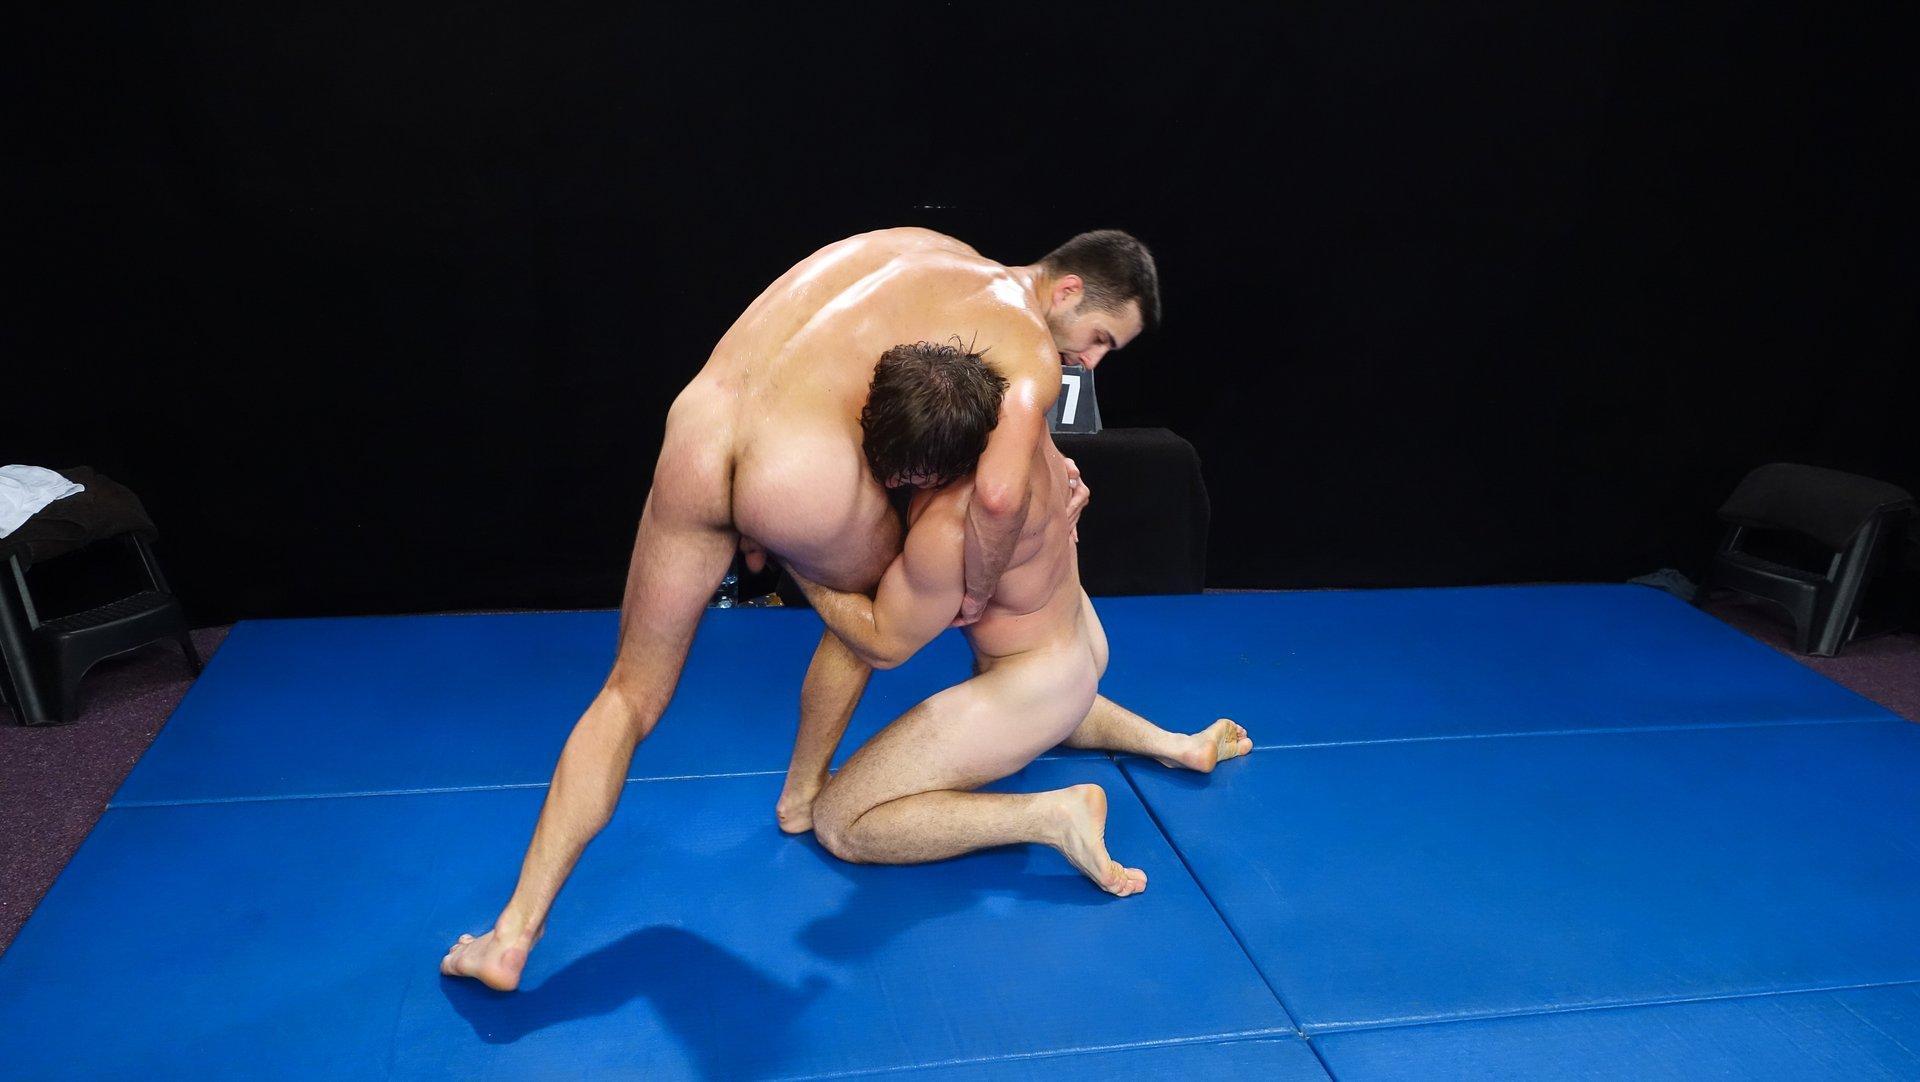 Photo number 5 from Alan vs Viktor - WRESTLING shot for swnude on Kink.com. Featuring Alan Carly and Viktor Burek in hardcore BDSM & Fetish porn.